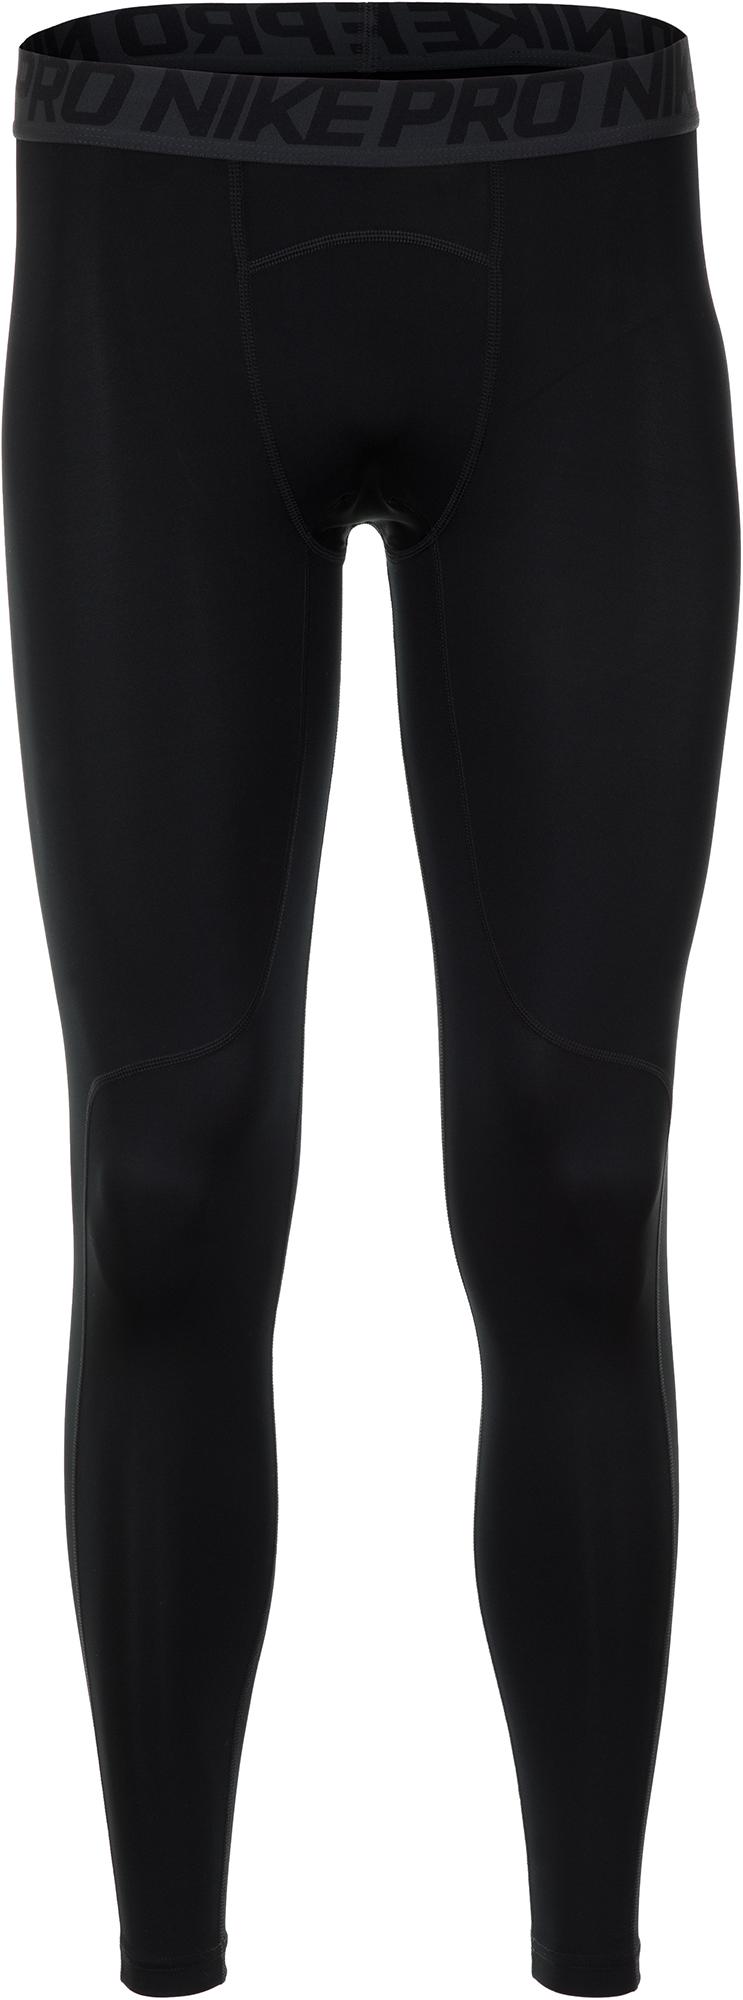 Nike Тайтсы мужские Pro, размер 46-48